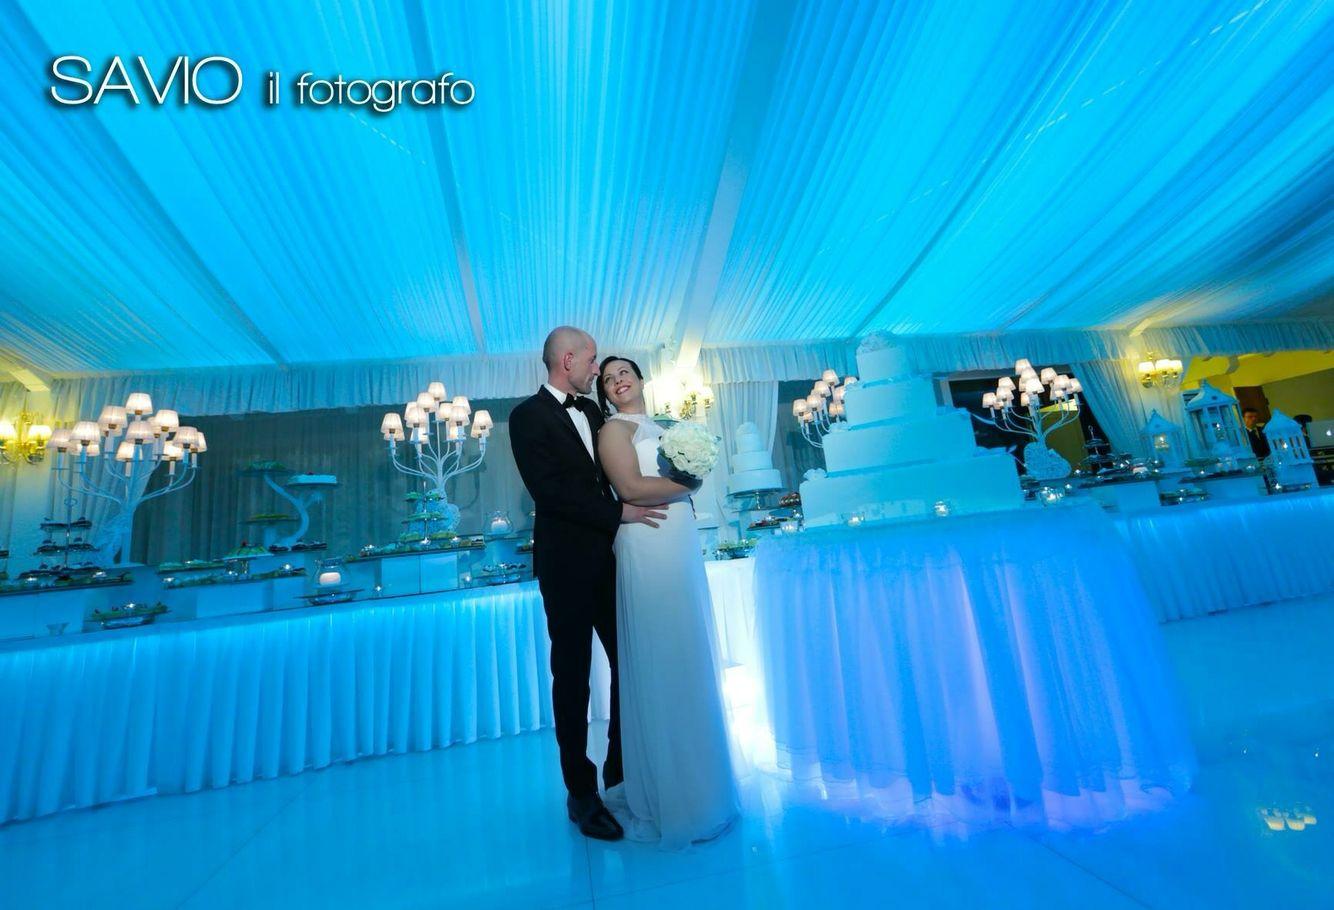 #casamento  #زواج #giardinodelmago #weddingday #matrimonio #mariage #sposa #bride #sposo